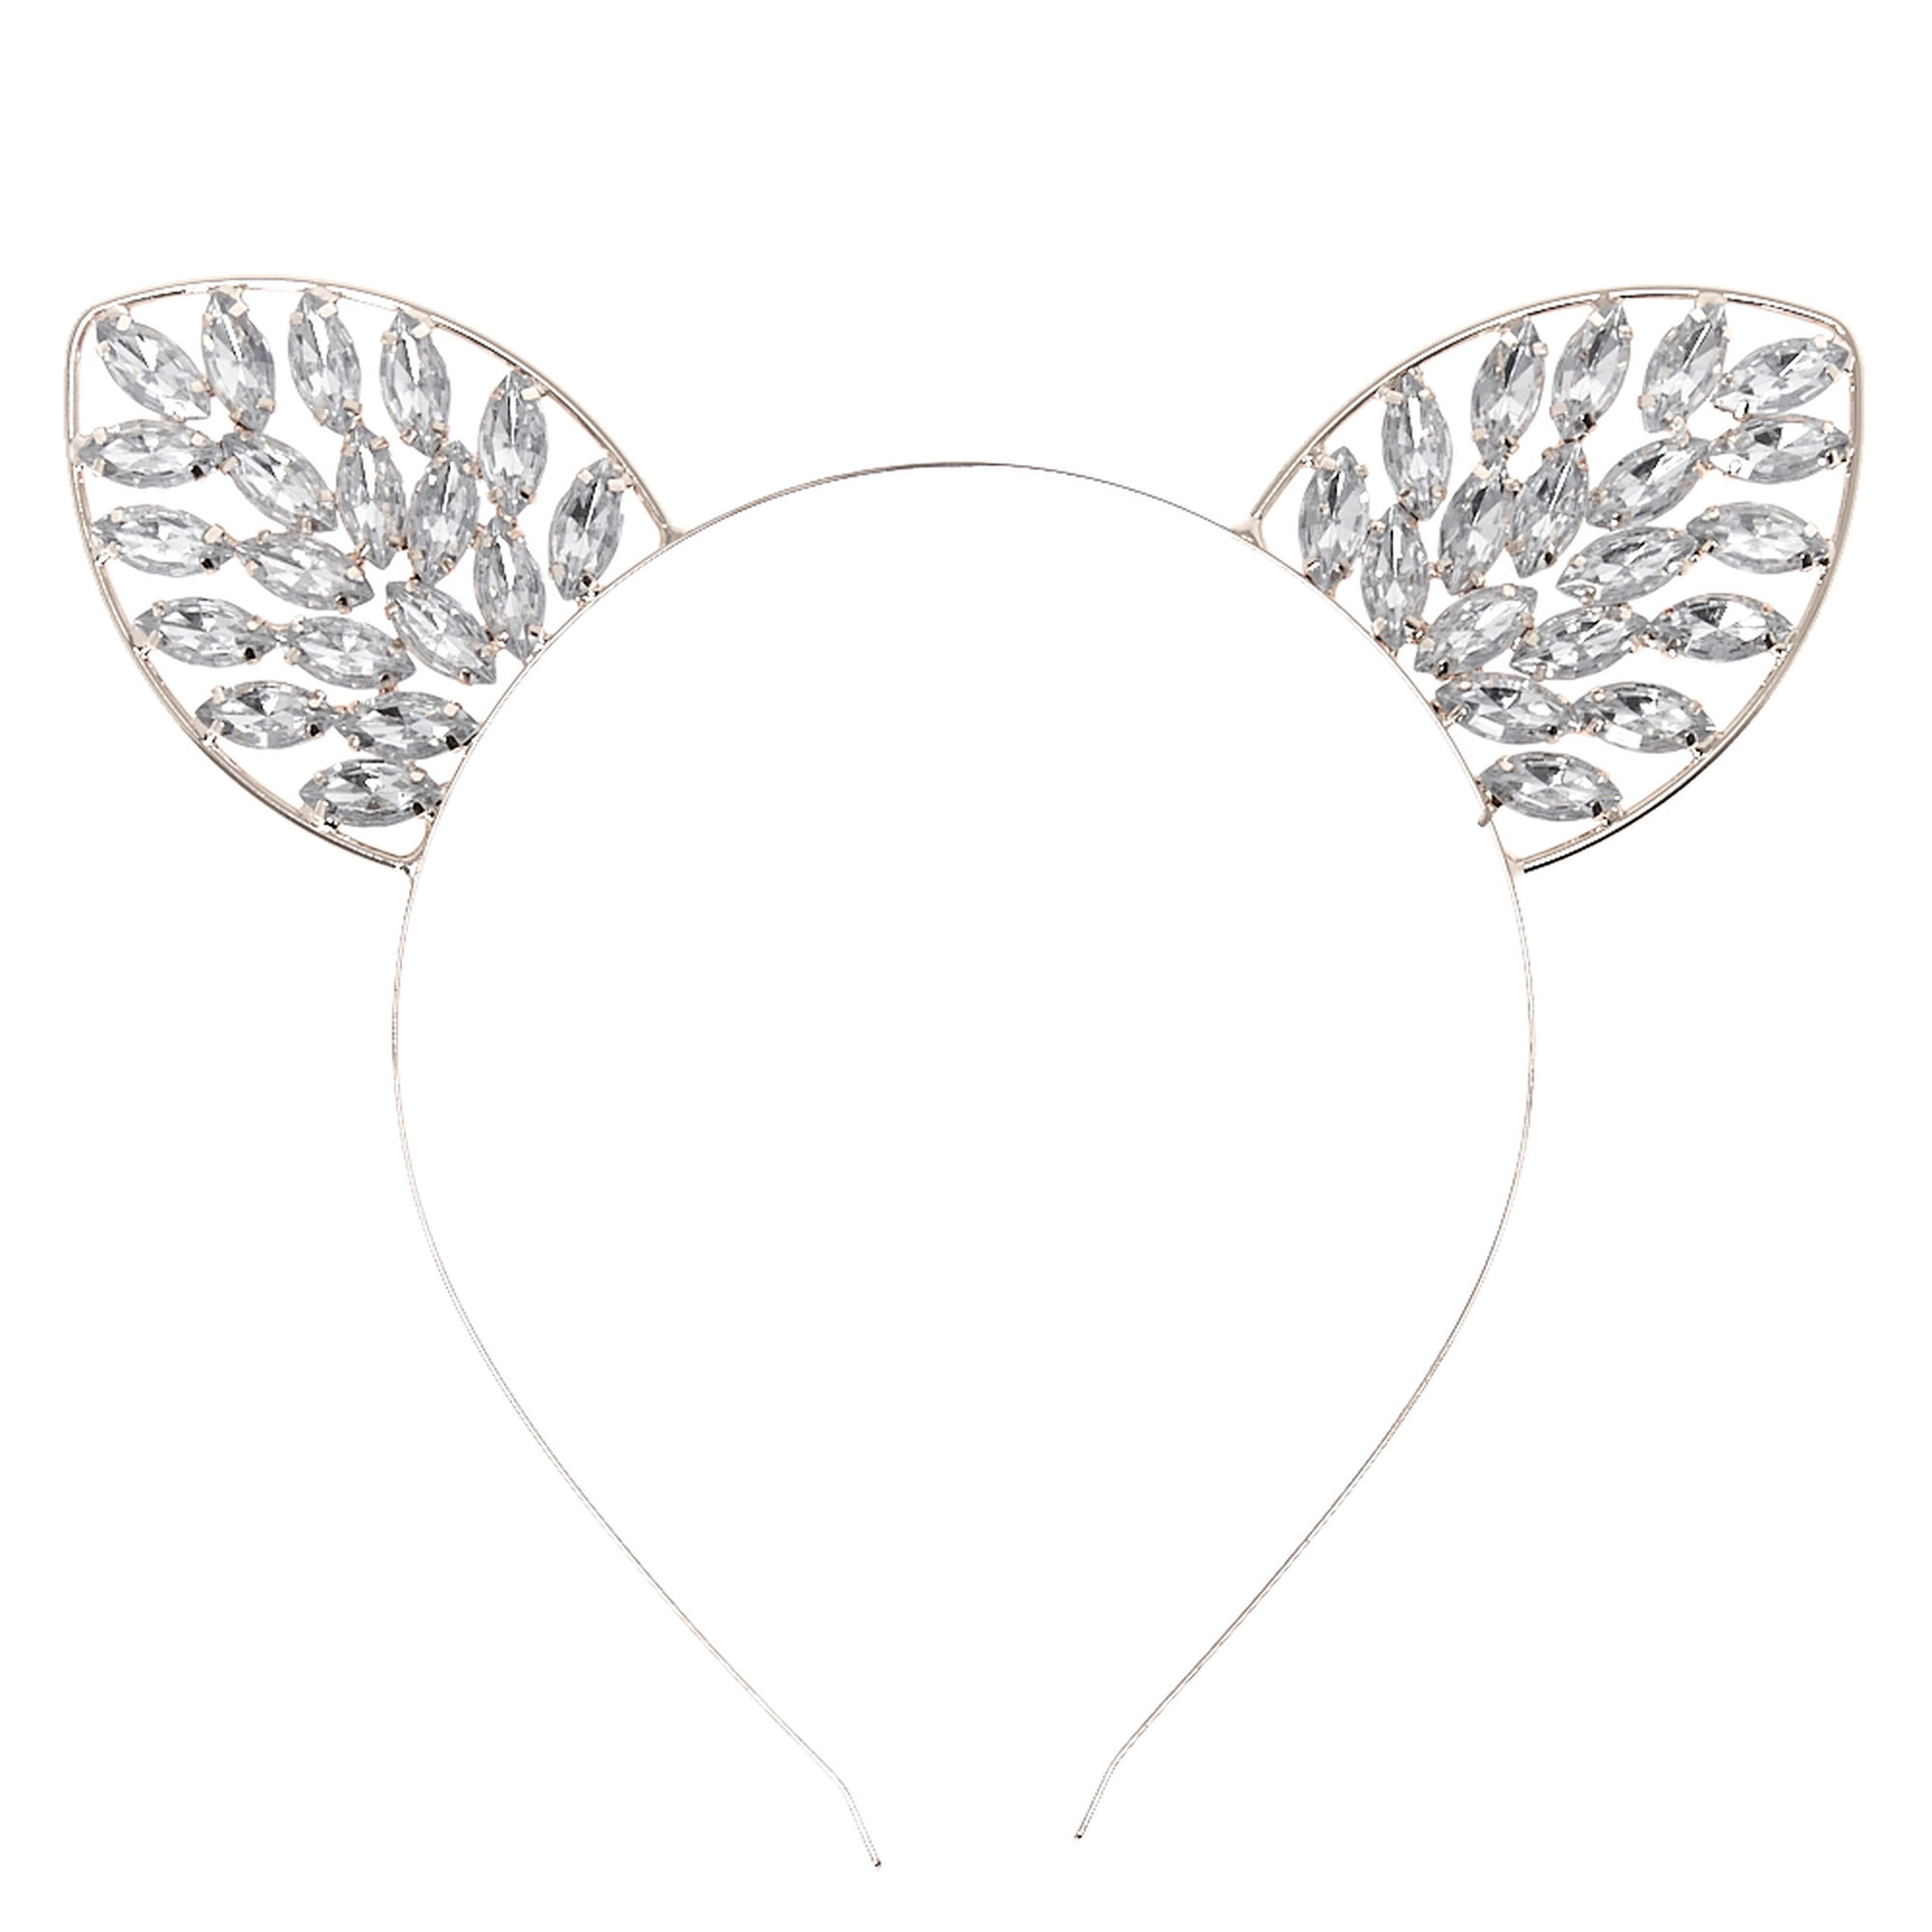 9ec2e089b78 Hematite Bling Cat Ears Headband | Claire's